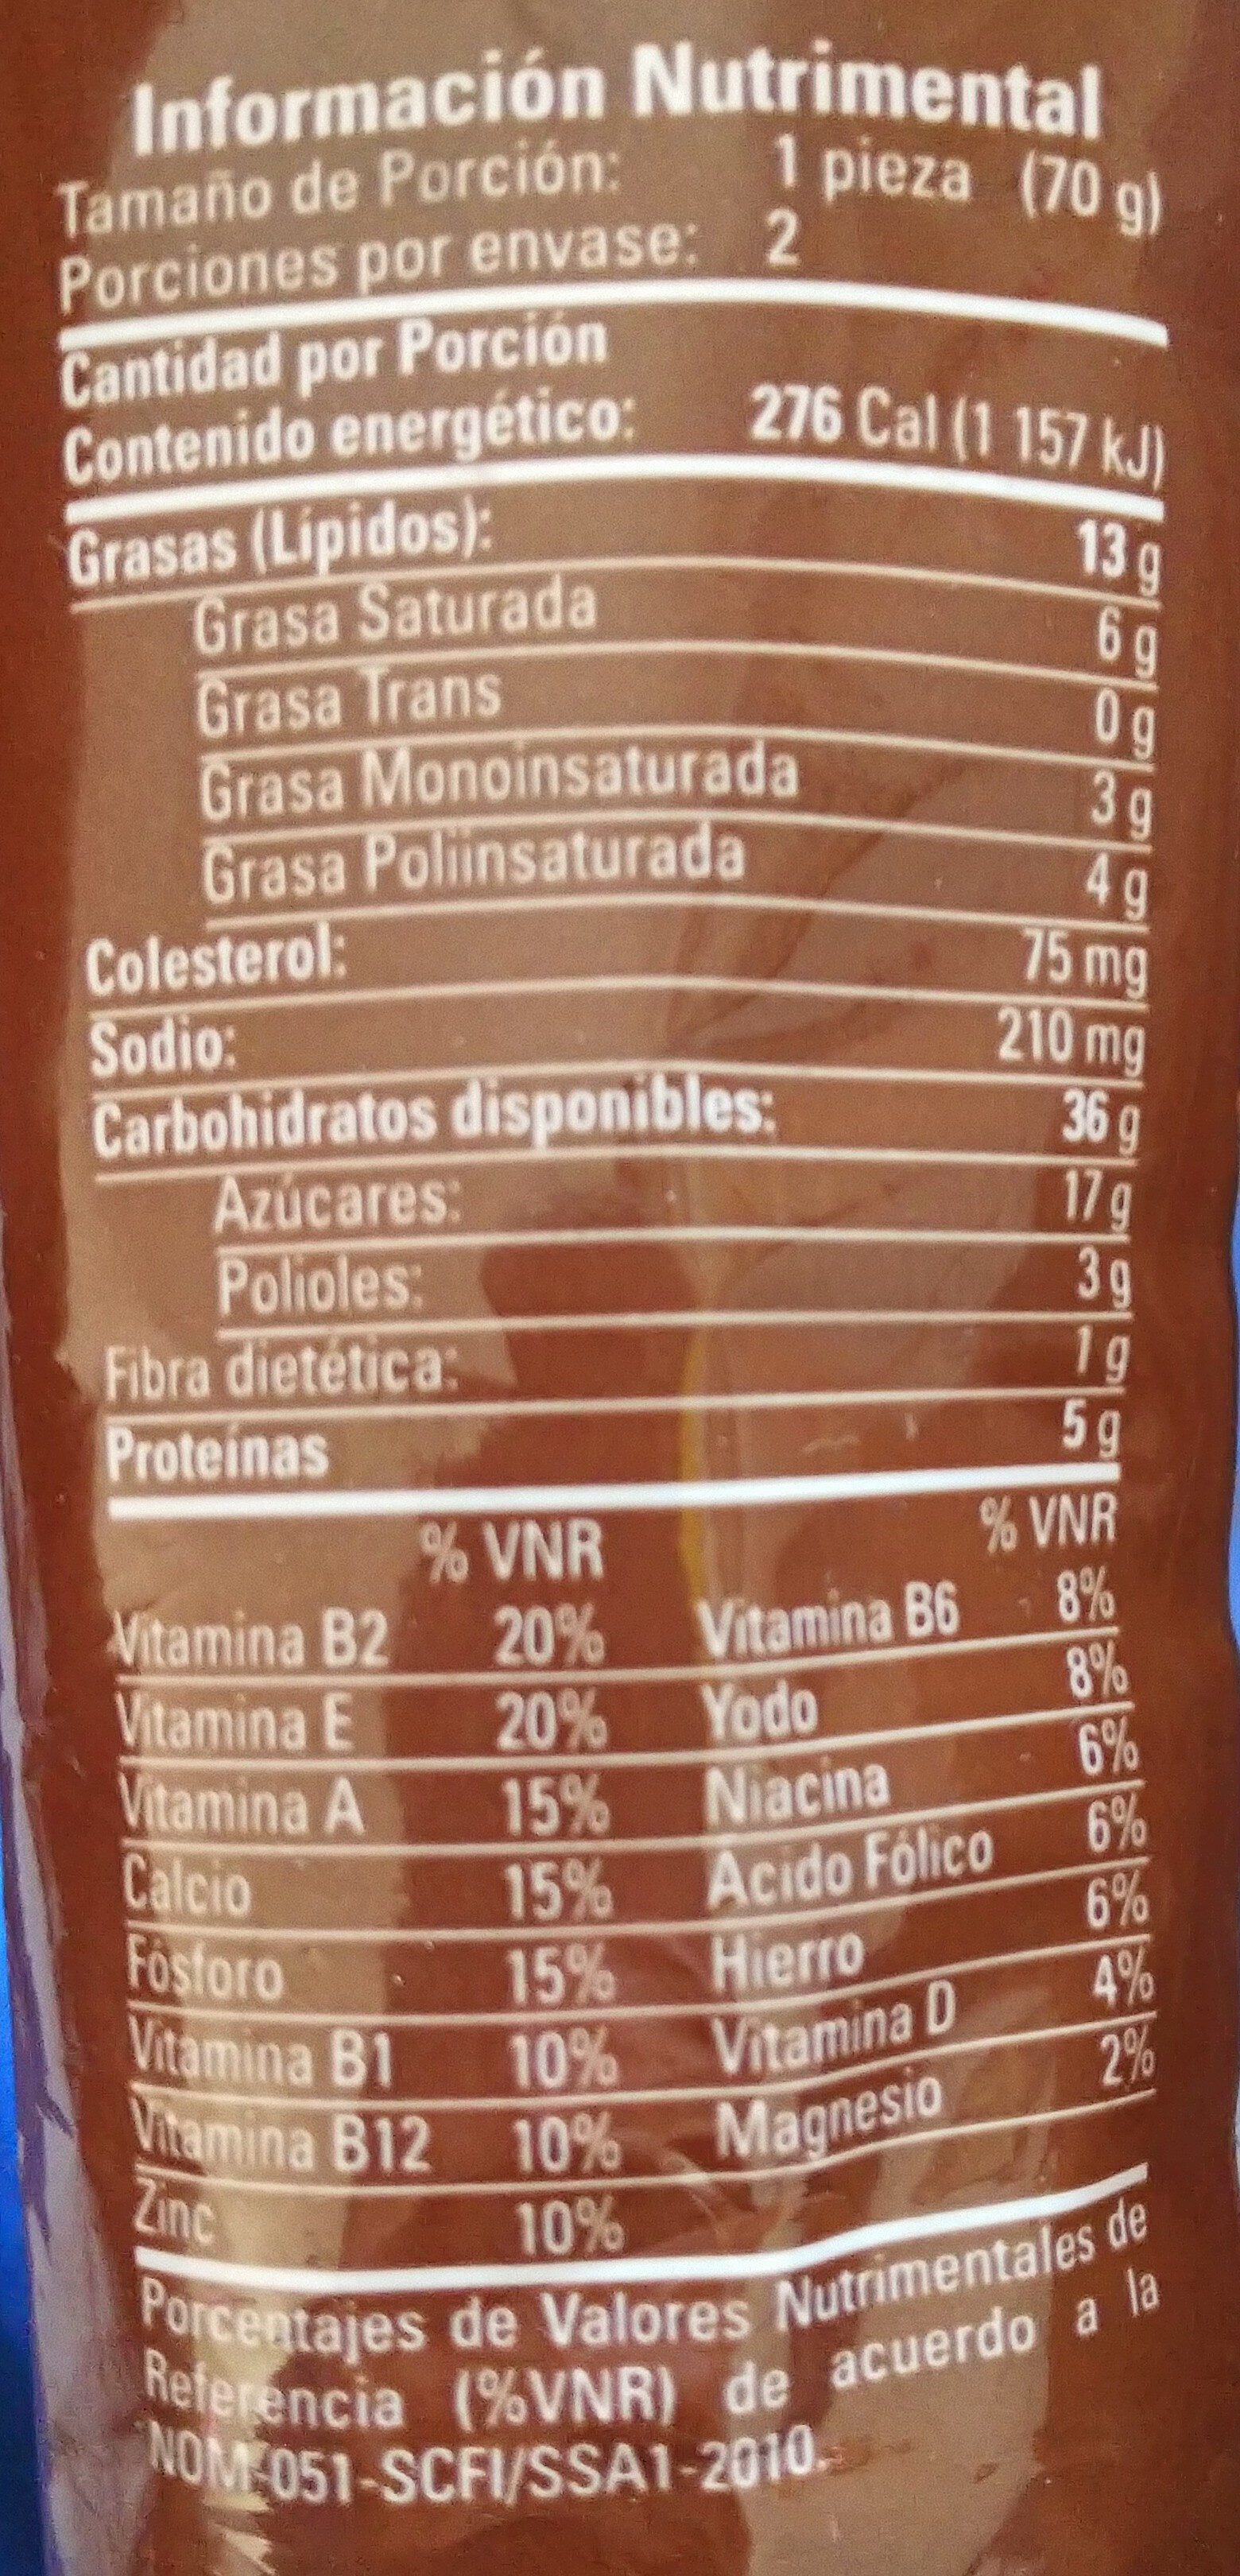 Panquecitos con chispas sabar a chocolate - Informació nutricional - es